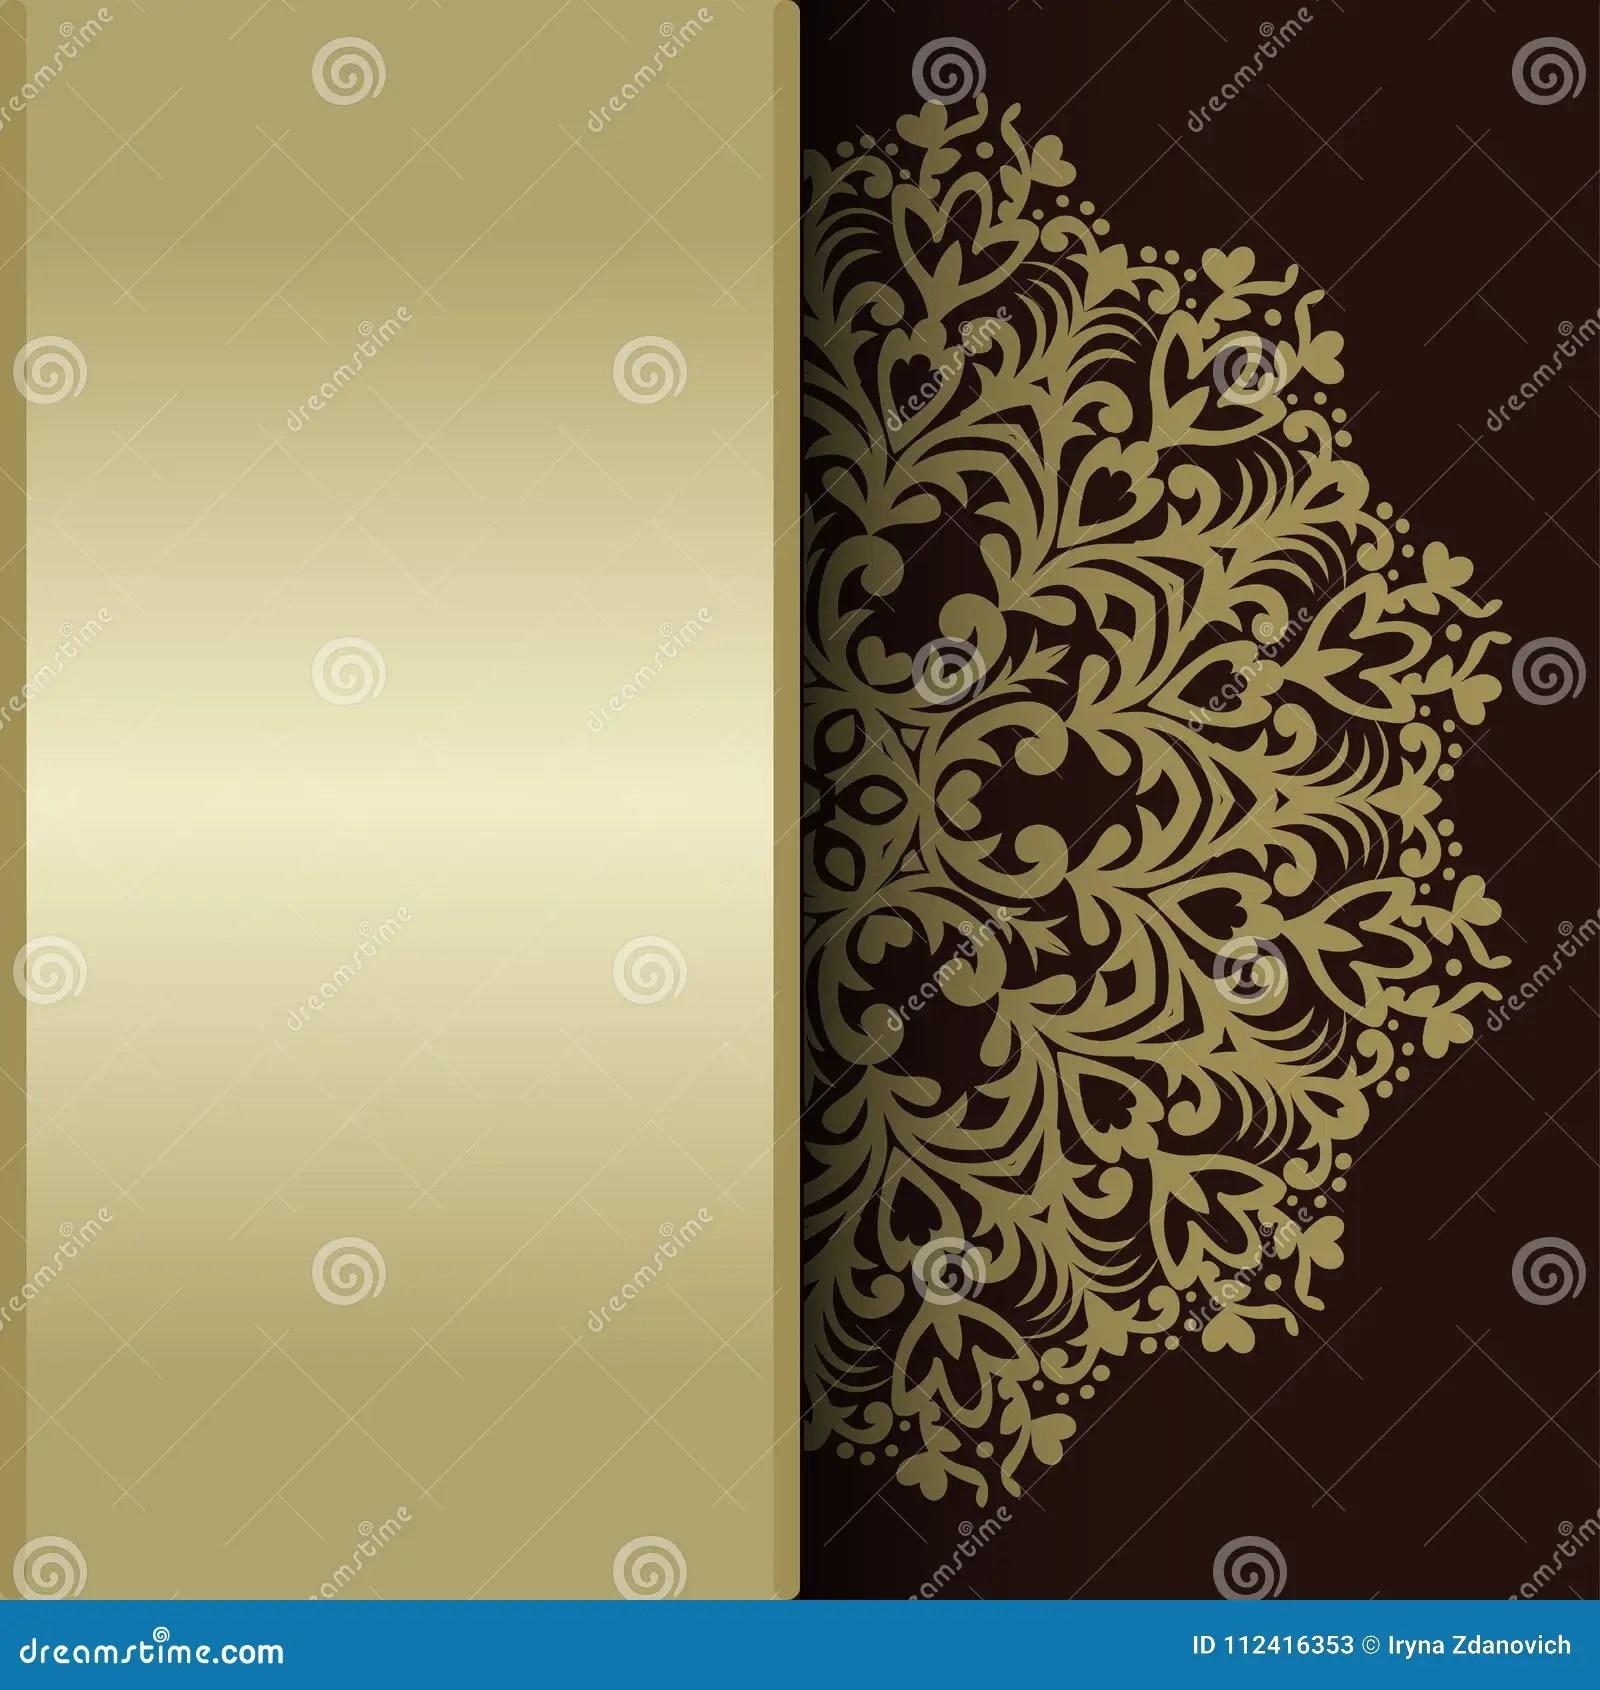 https www dreamstime com blank vertical stripe label invitation card wedding blank vertical stripe label invitation card wedding image112416353